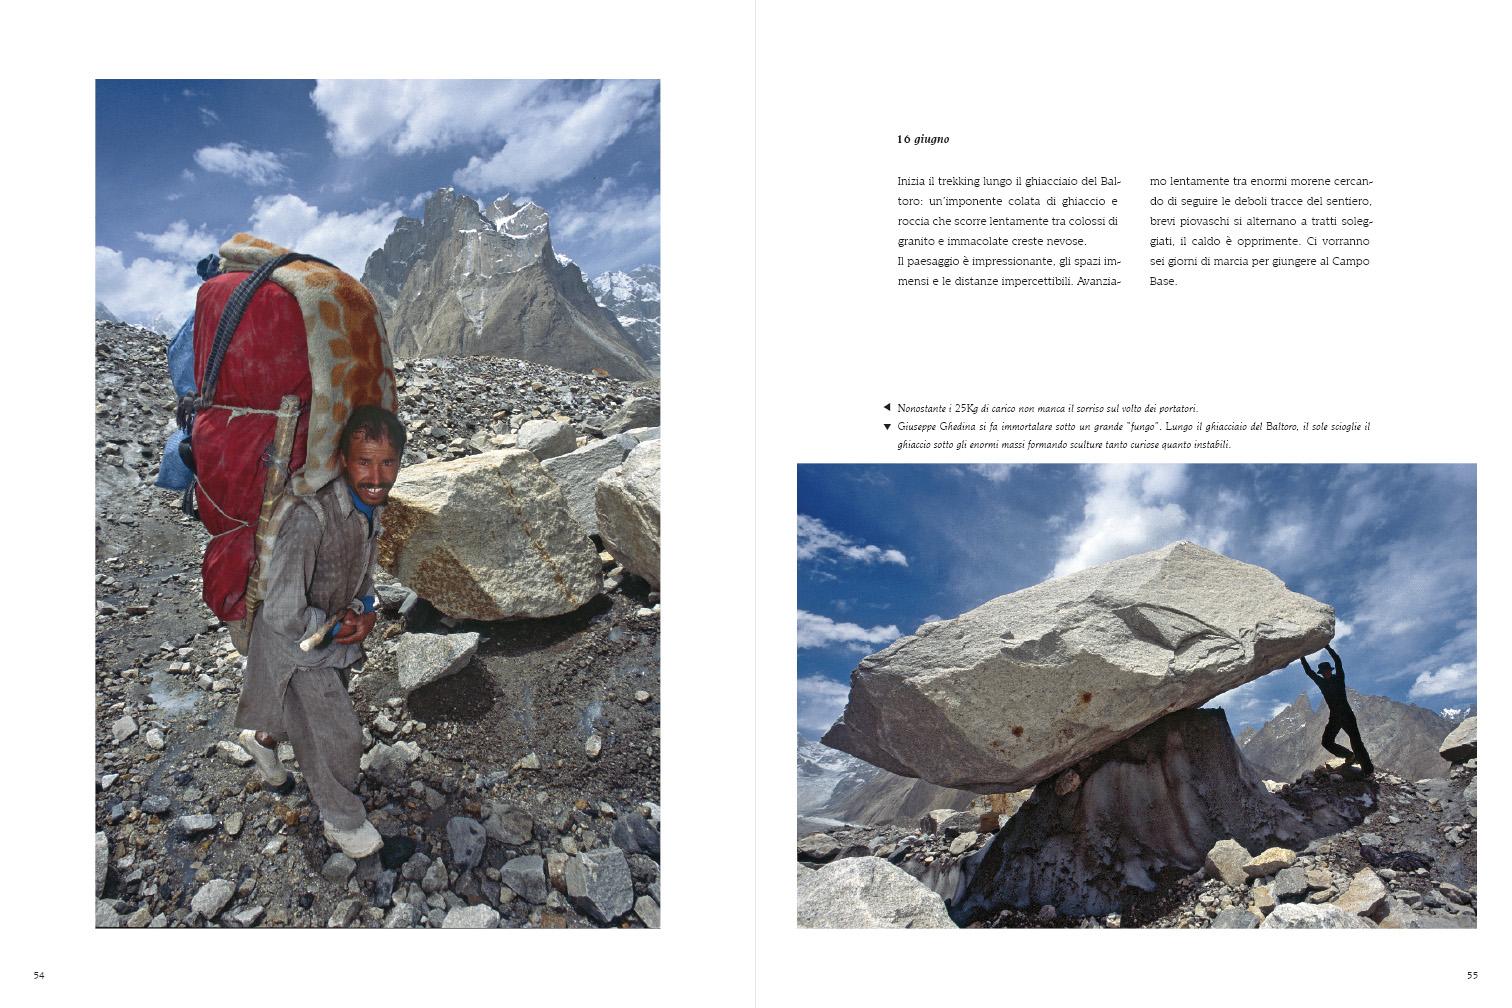 K2 EXPEDITION 1954-2004 Giuseppe Ghedina Fotografo - 029.jpg